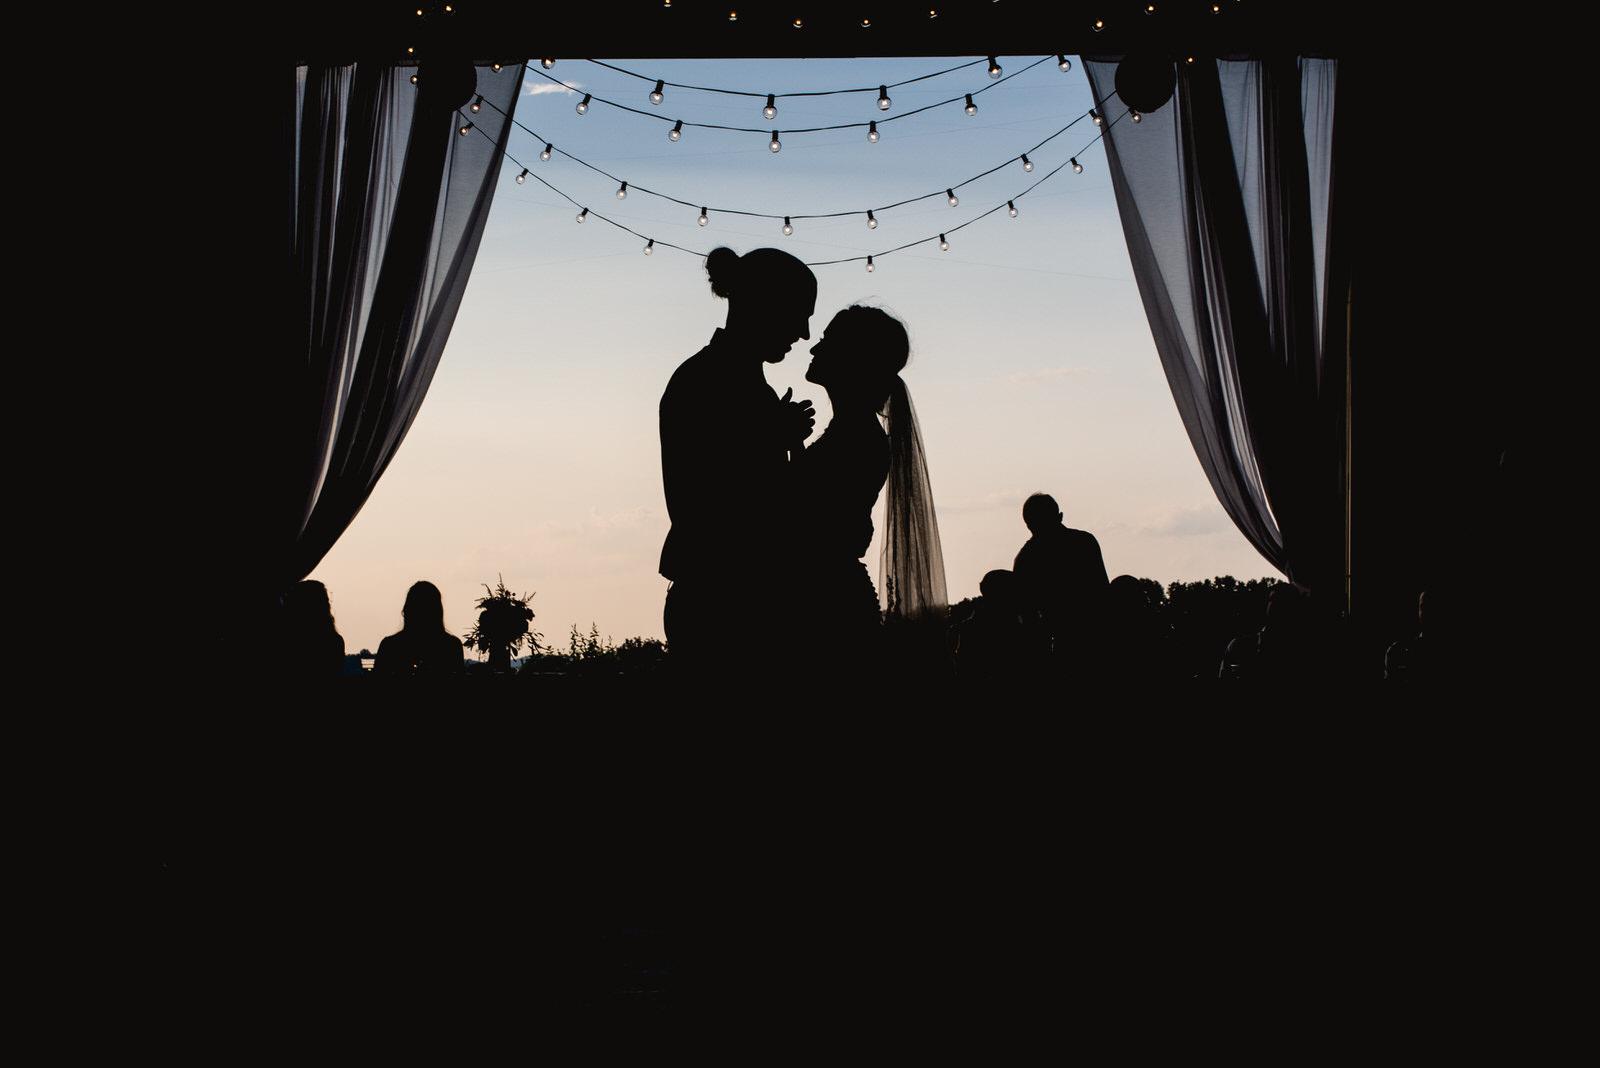 destiny-hill-farm-wedding-photos-pittsburgh-wedding-photographers-76.jpg